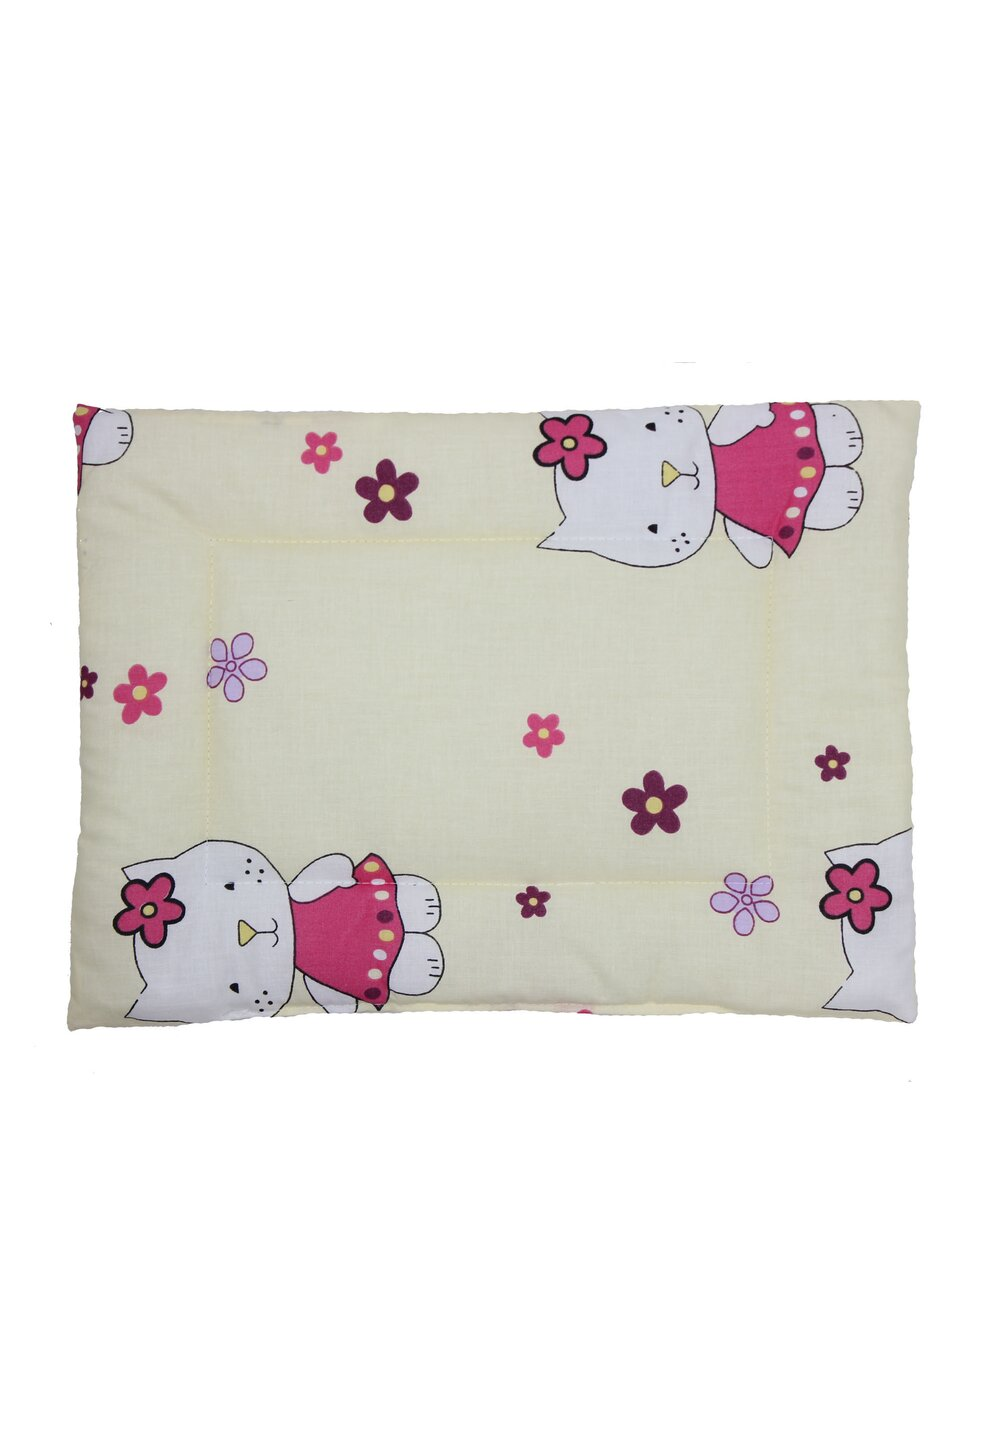 Perna slim, Hello Kitty, crem, 37 x 28 cm imagine